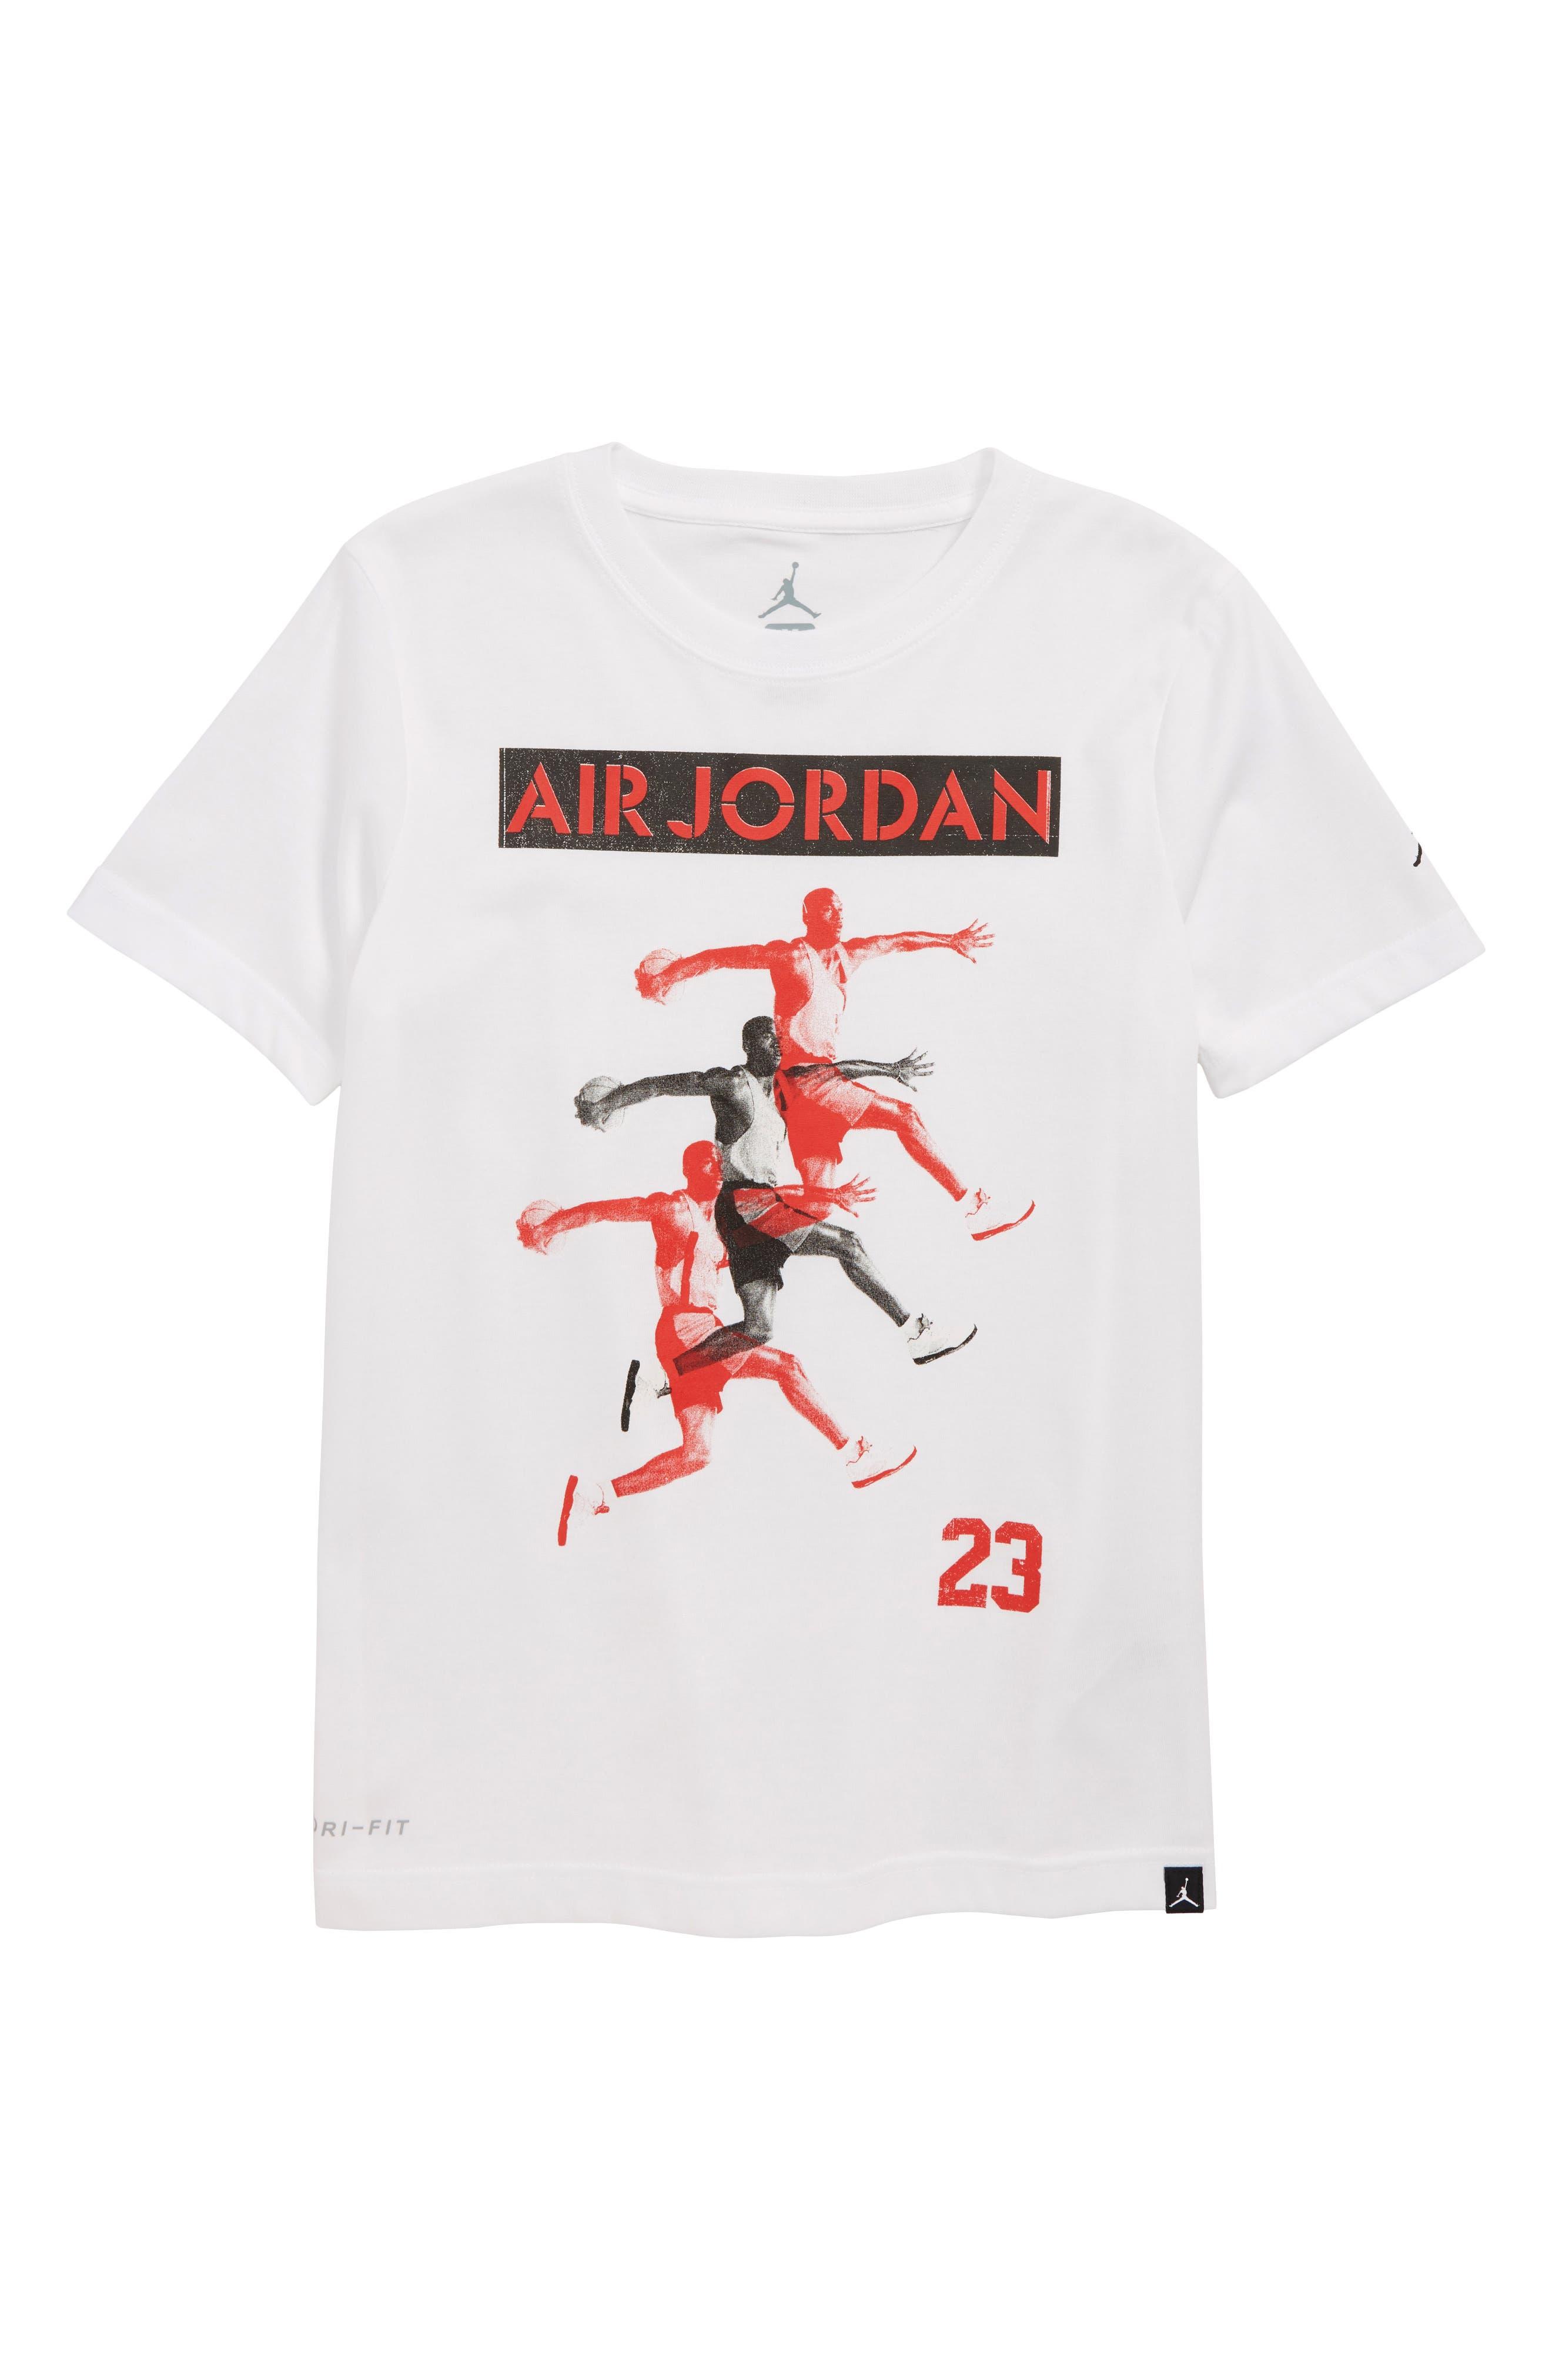 Jordan Basketball T-Shirt,                             Main thumbnail 1, color,                             100